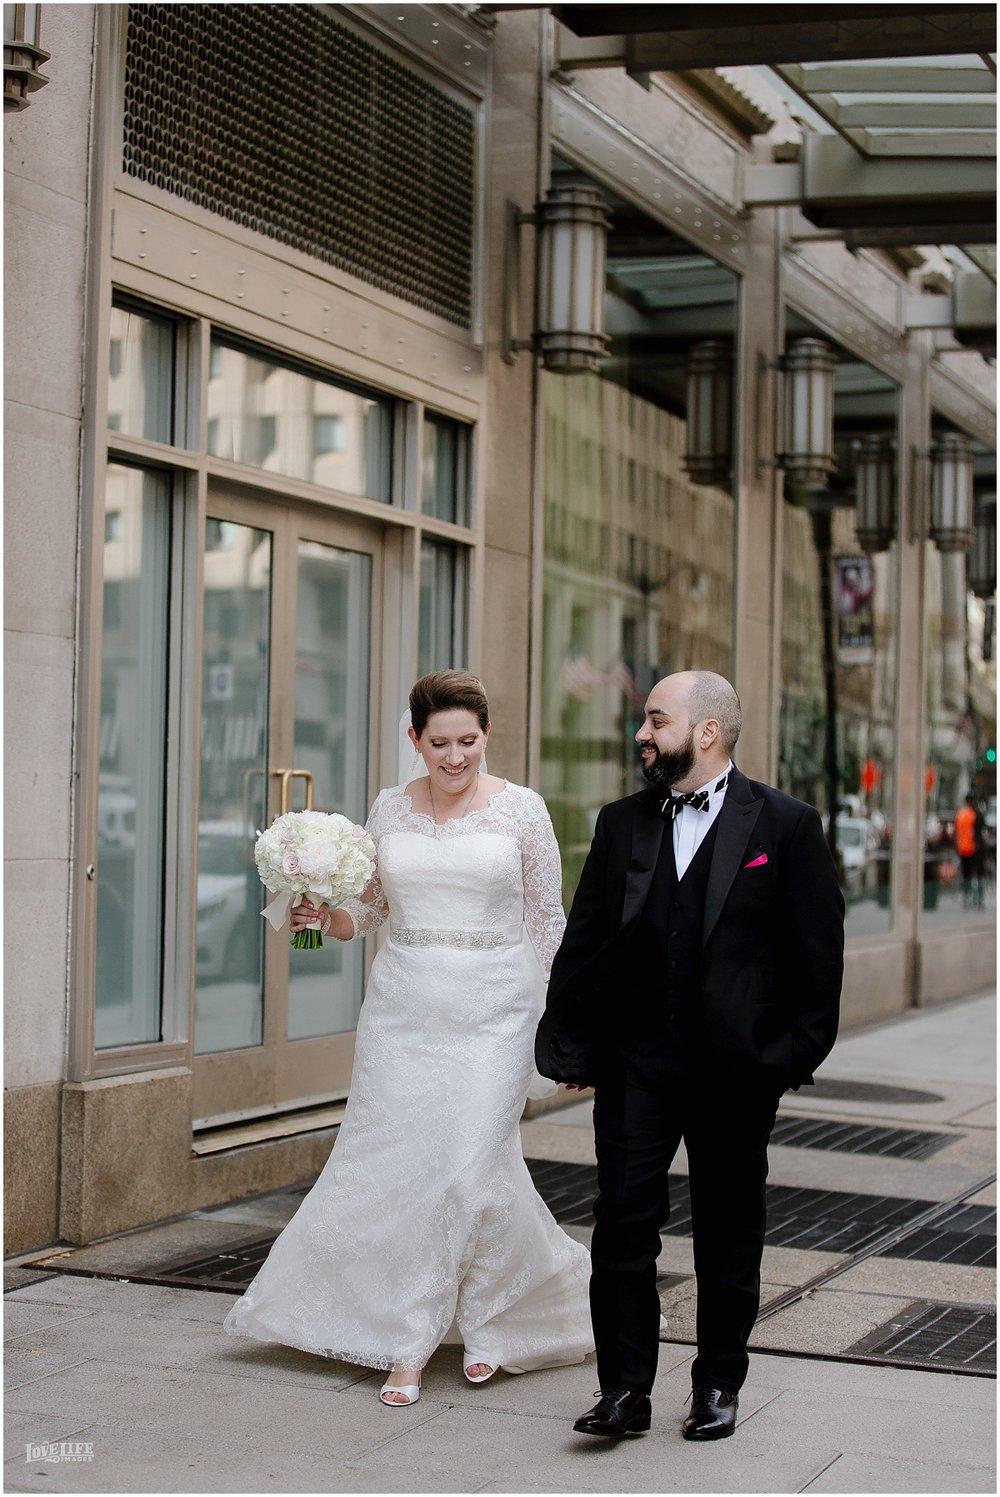 W Hotel DC wedding bride and groom walking portrait.jpg